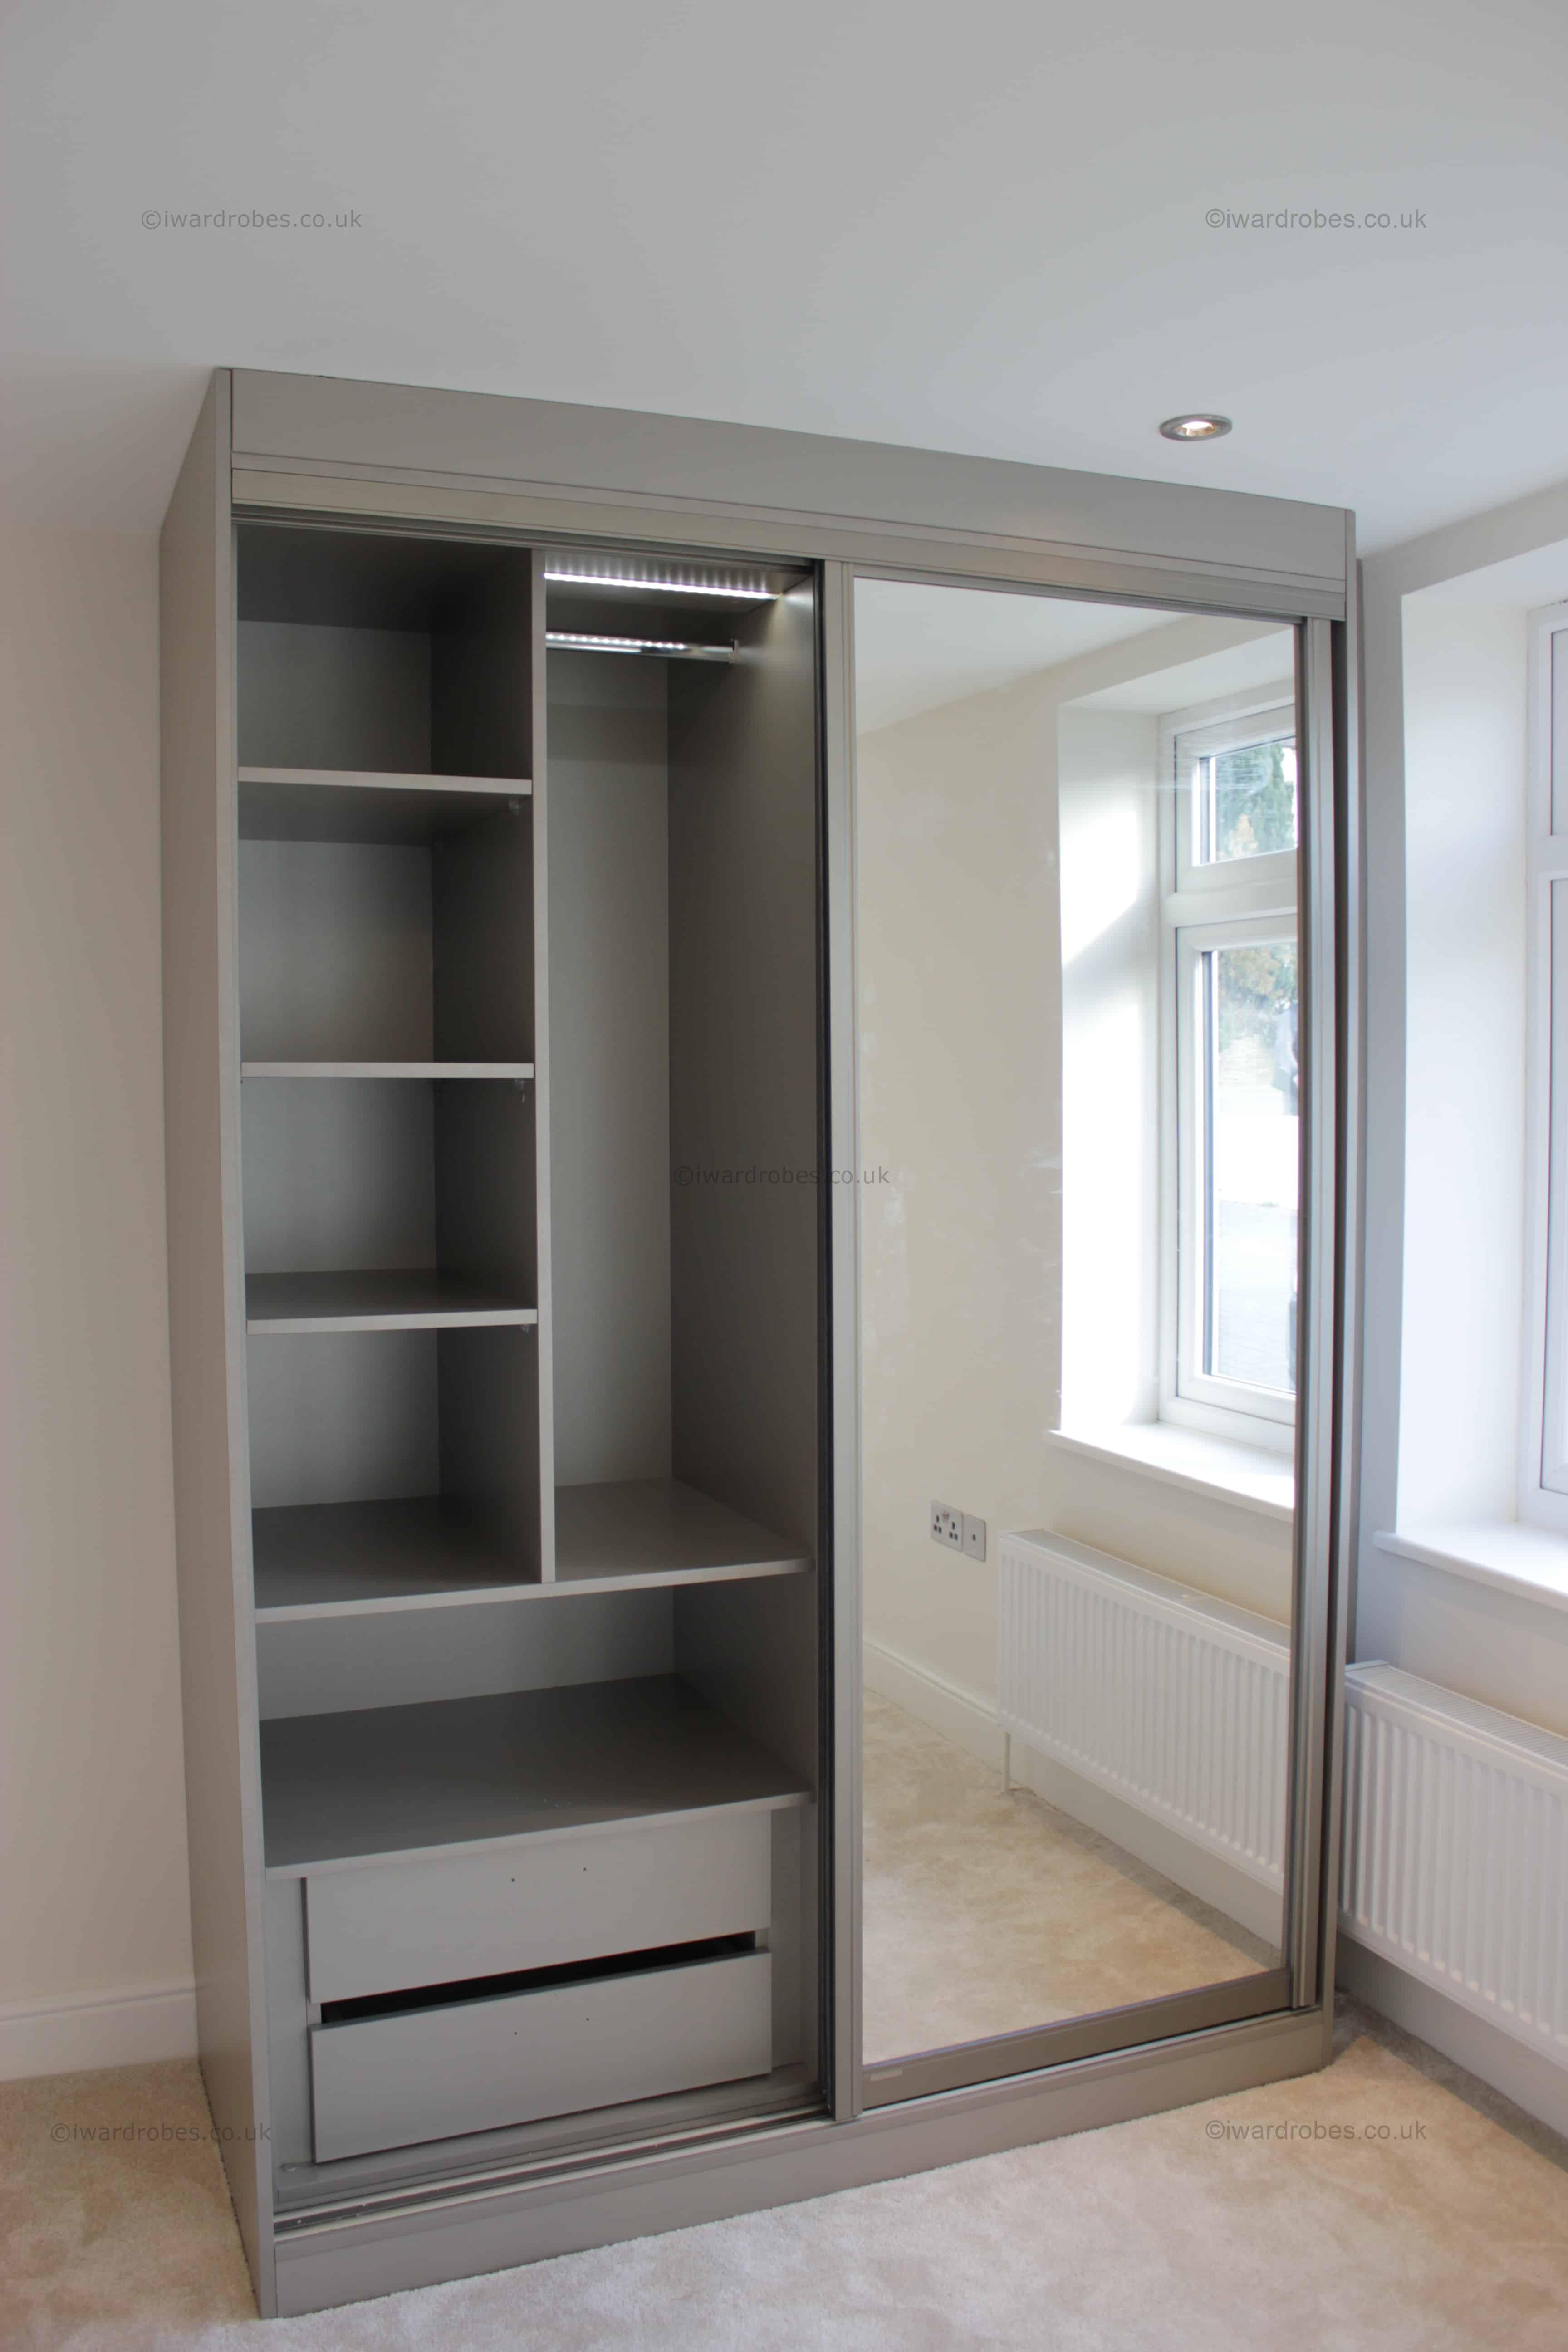 Fitted sliding mirror door wardrobe Putney | i-Wardrobes ...